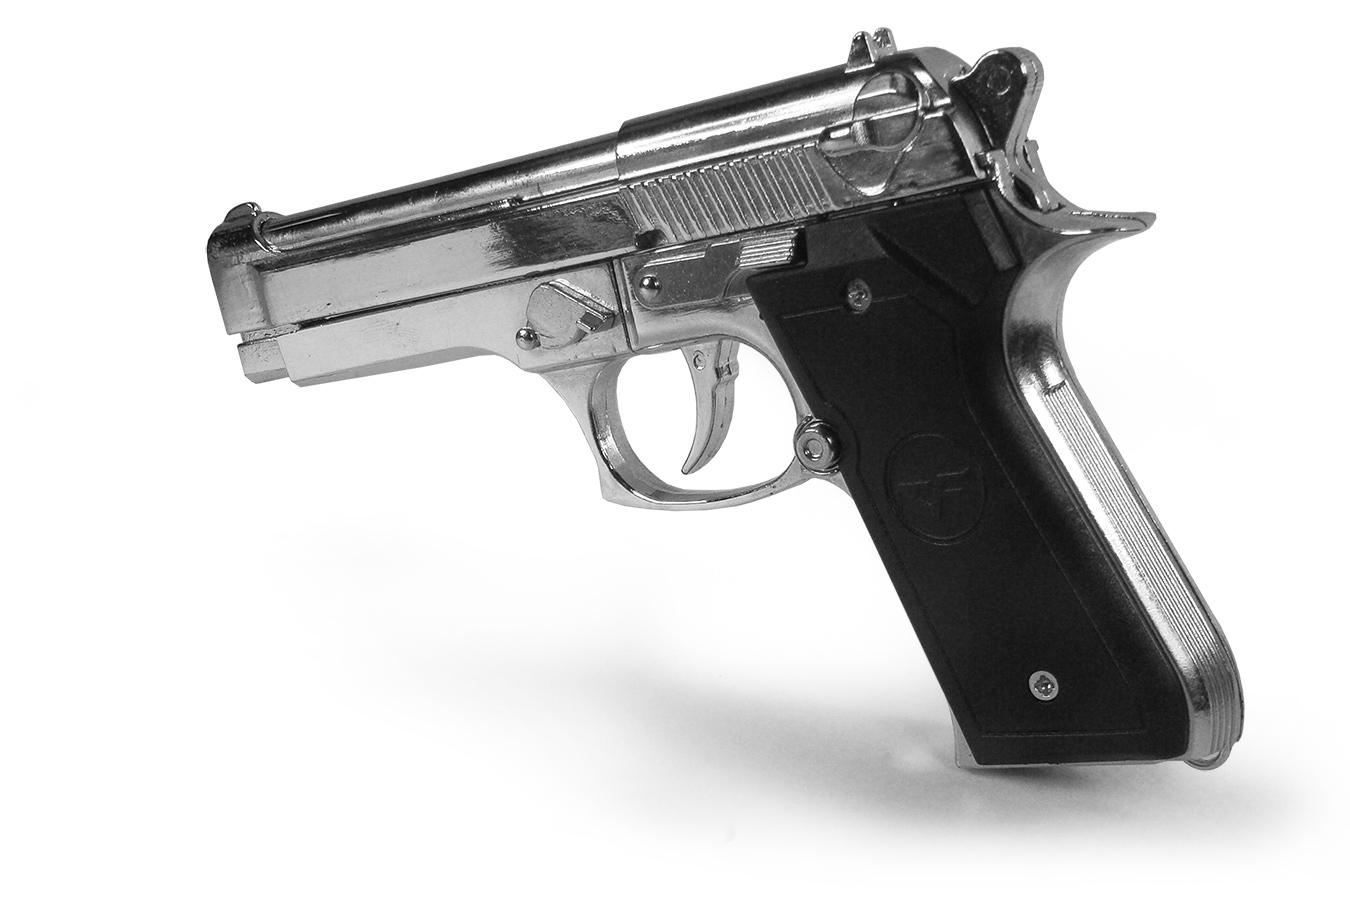 Макет пистолета Beretta 92FS, 15 см серебристая